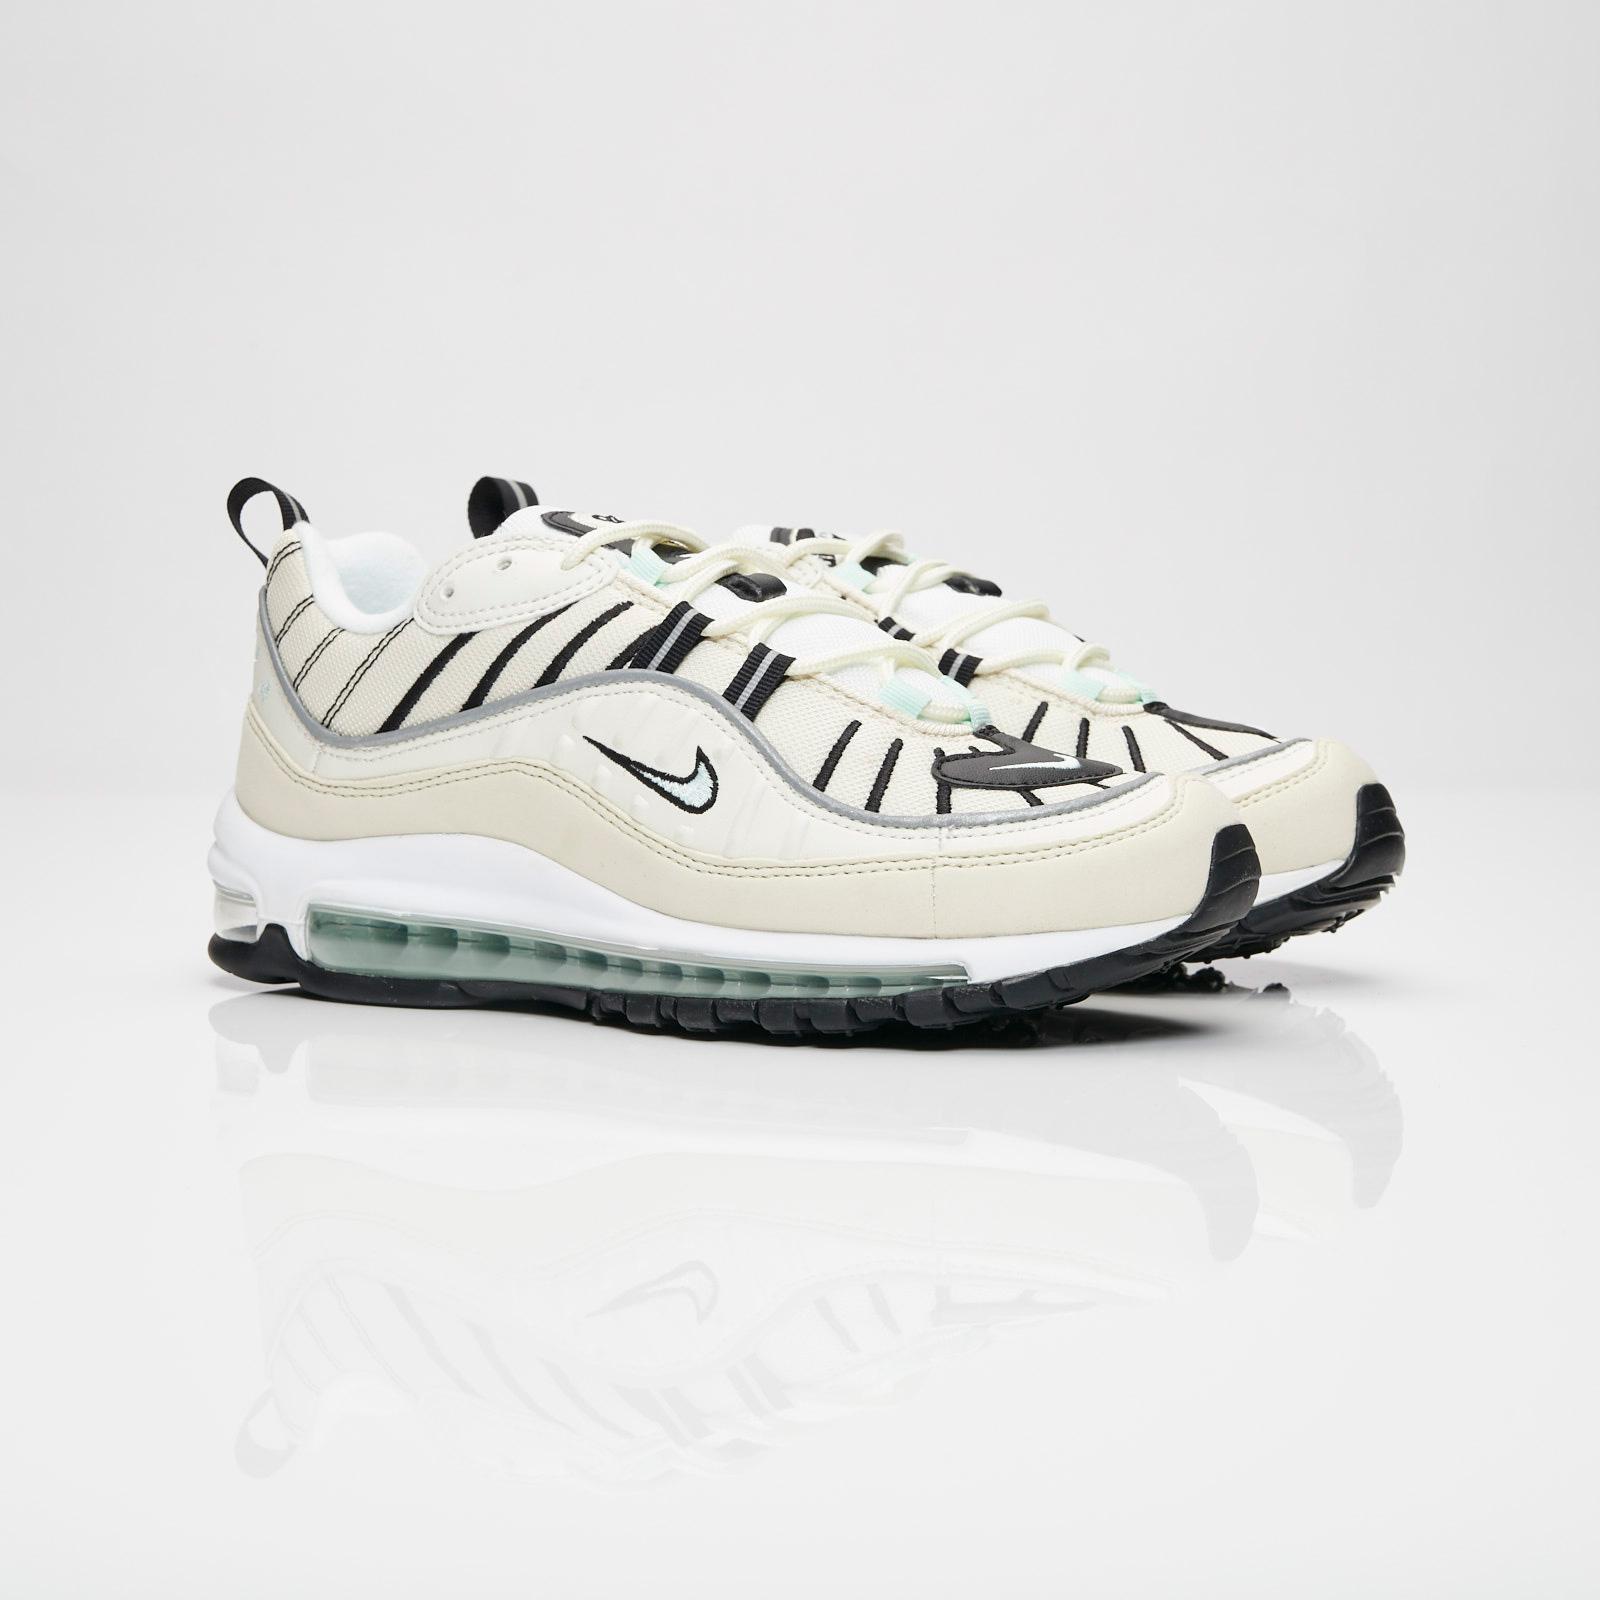 Nike Wmns Air Max 98 - Ah6799-105 - Sneakersnstuff  ecf43c117